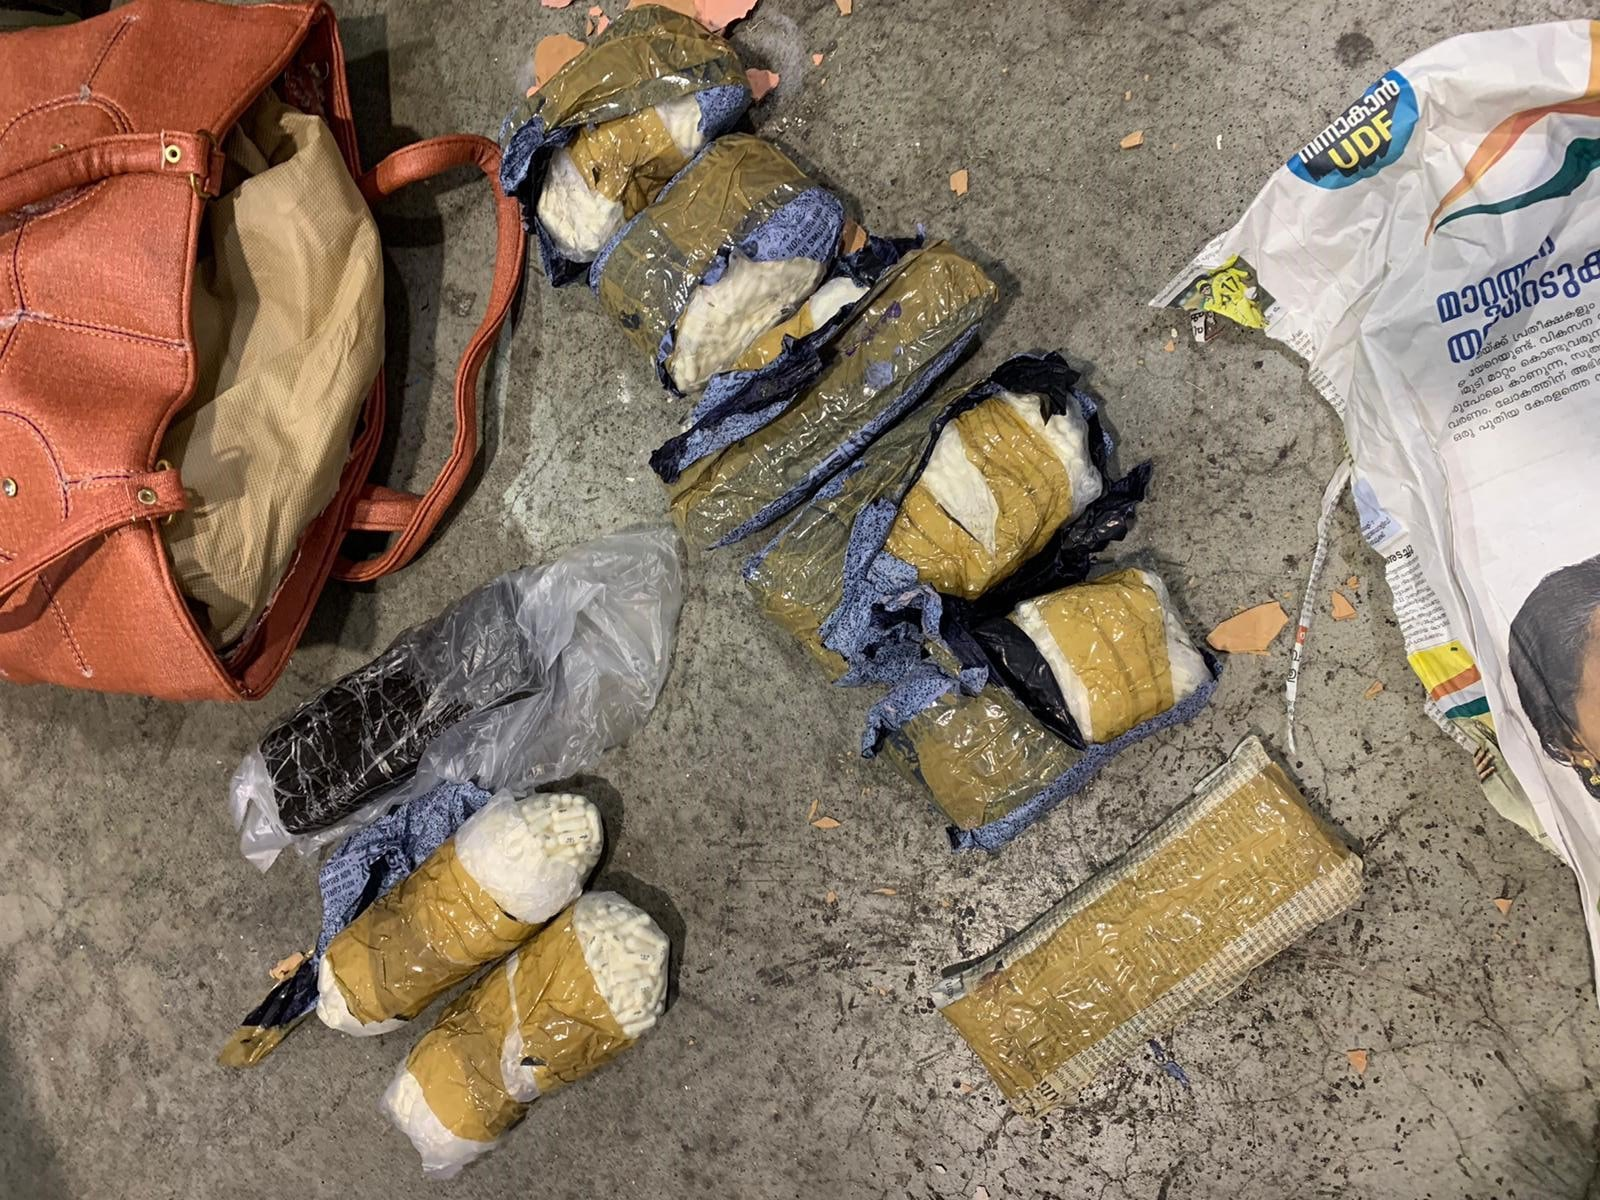 Qatar customs seize narcotics in personal belongings